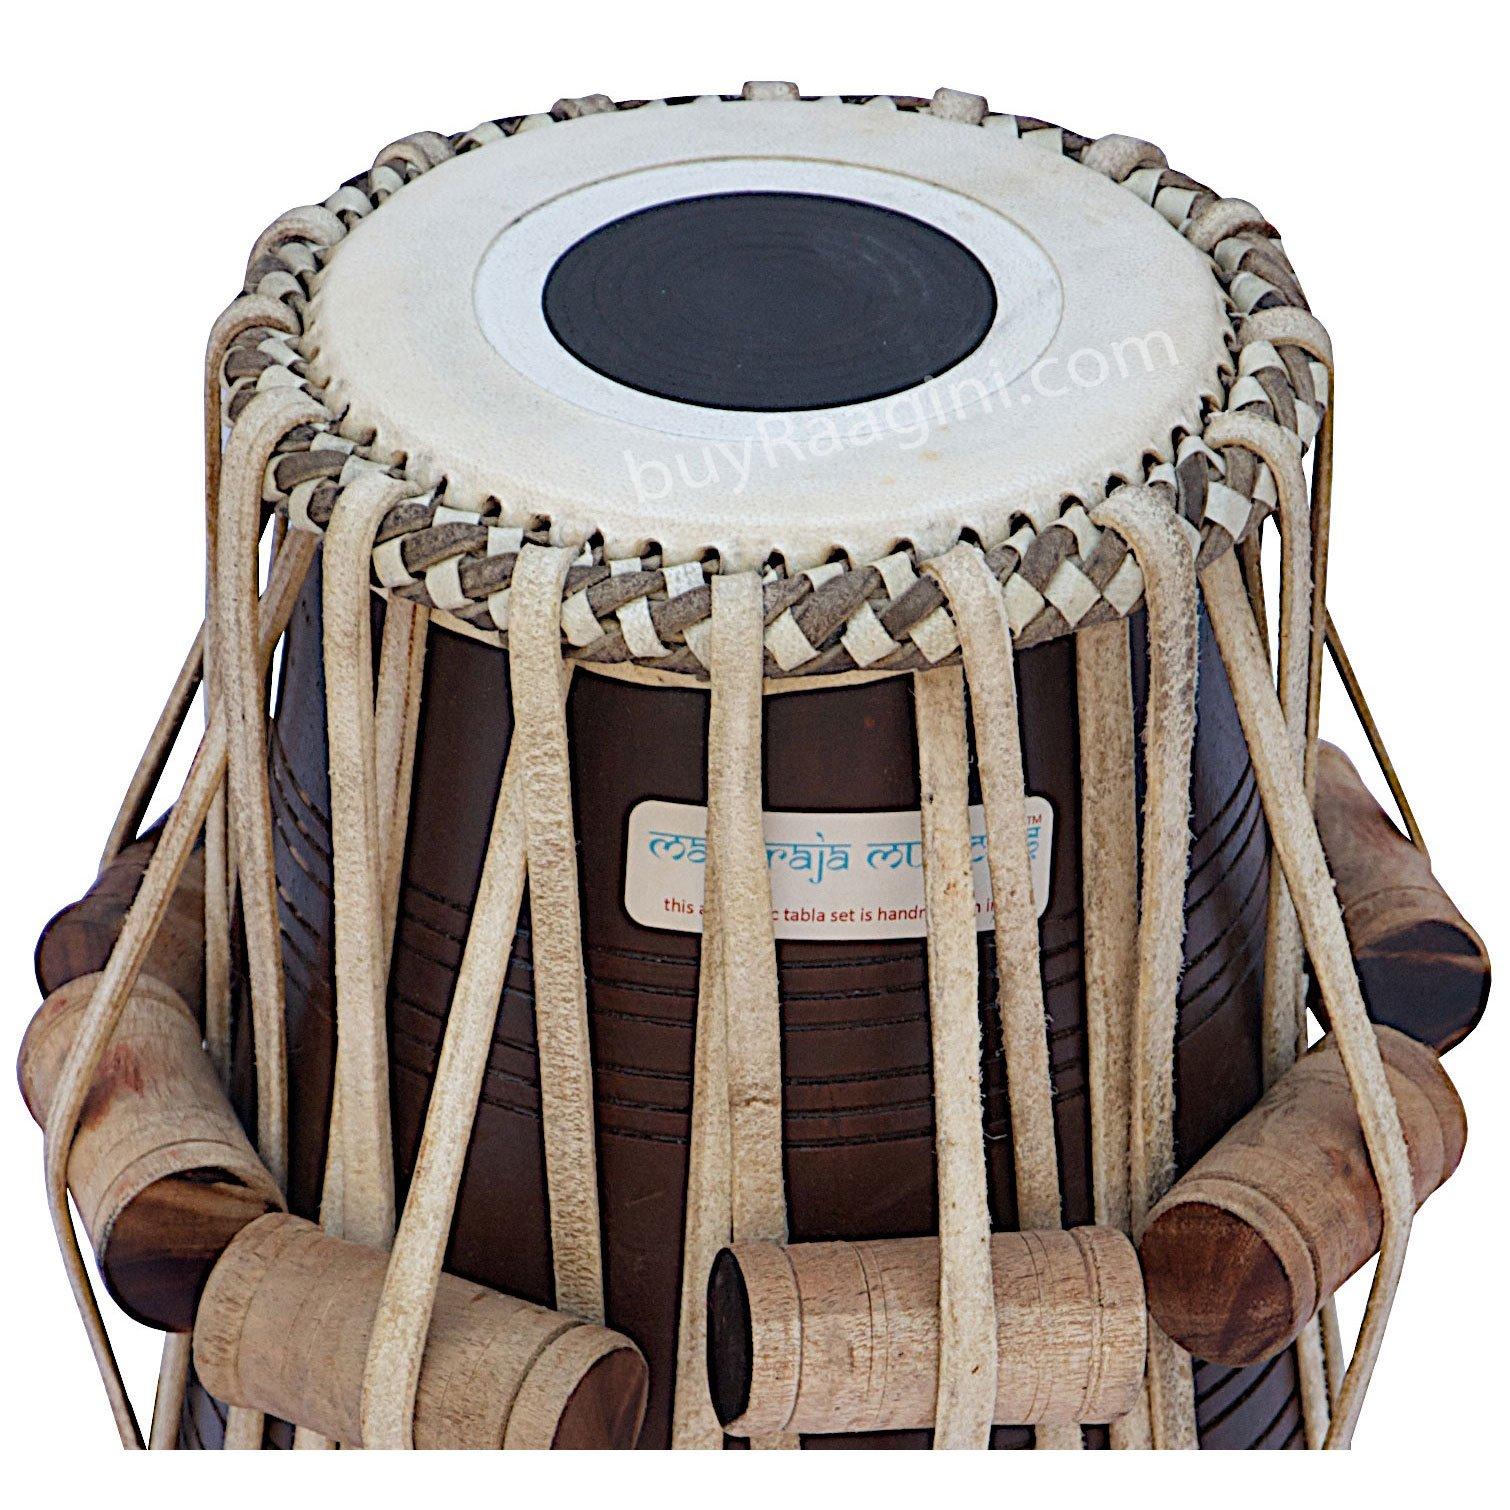 Tabla Set, Maharaja Musicals, 3.5 Kg Designer Golden Brass Bayan, Sheesham Tabla Dayan, Professional Drums, Padded Bag, Book, Hammer, Cushions, Cover, Tabla Drums Indian (PDI-FG) by Maharaja Musicals (Image #7)